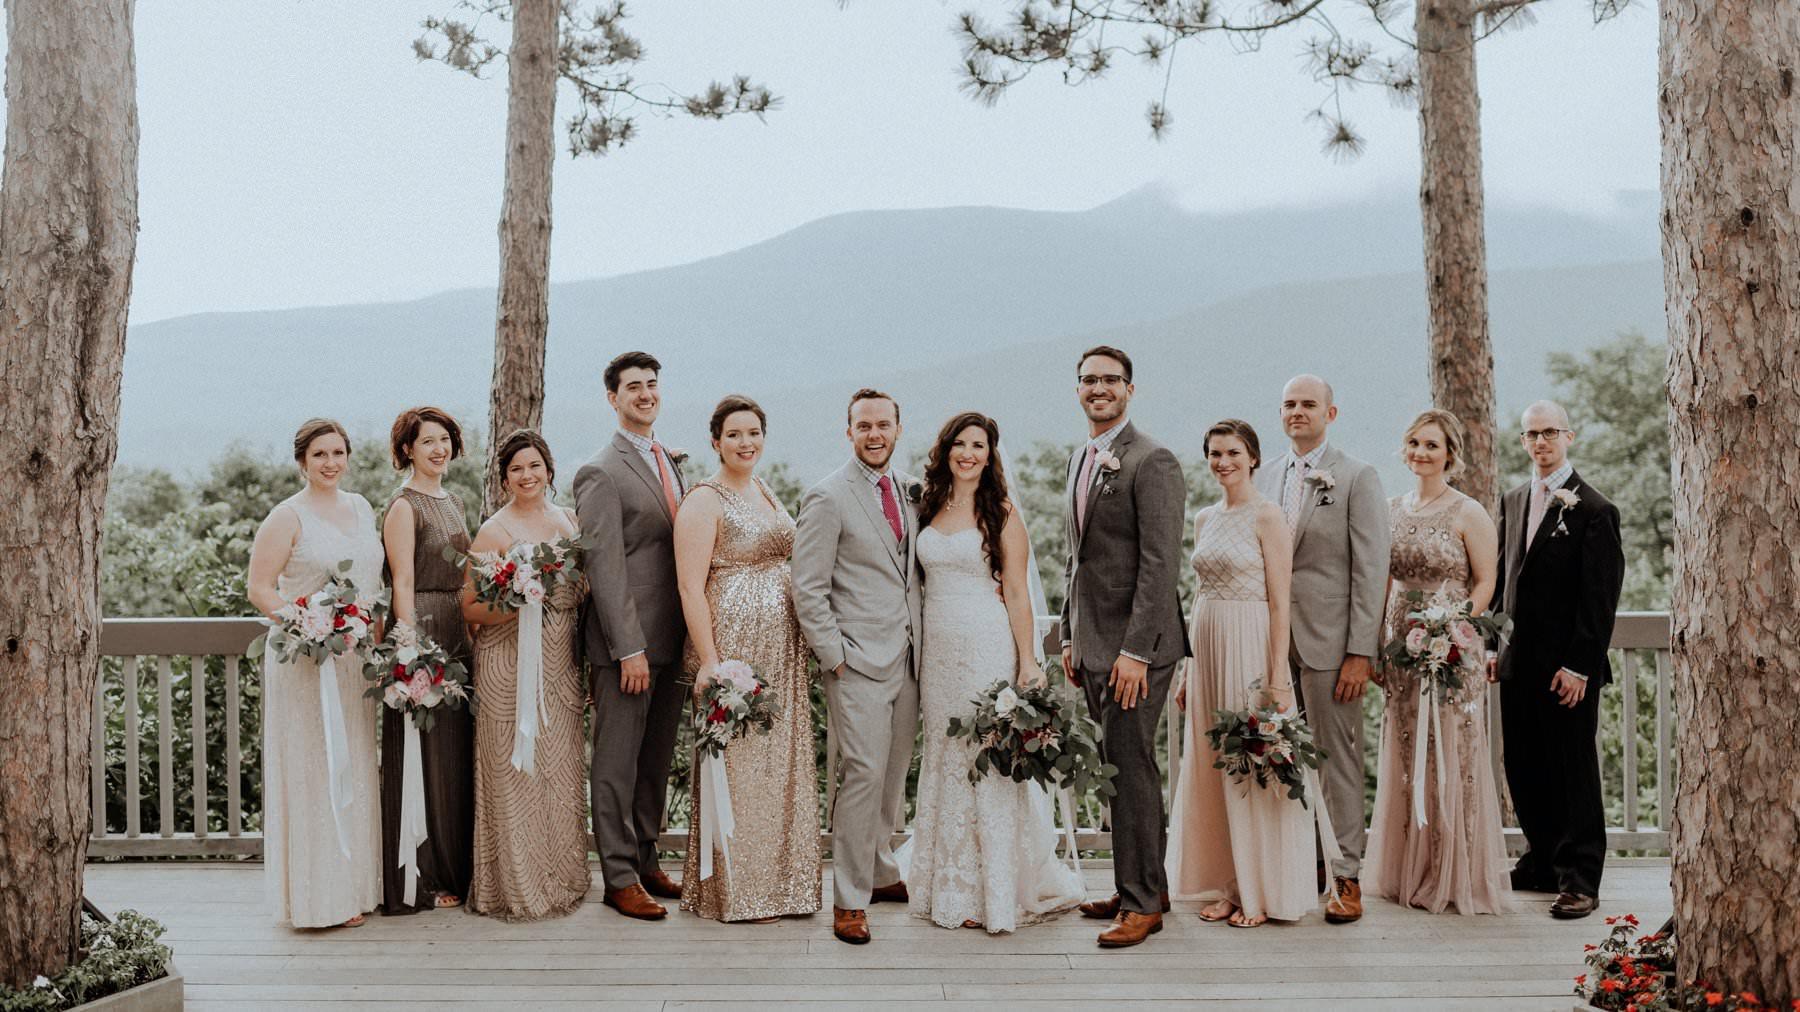 Onteora-Mountain-House-wedding-photographer-64.jpg